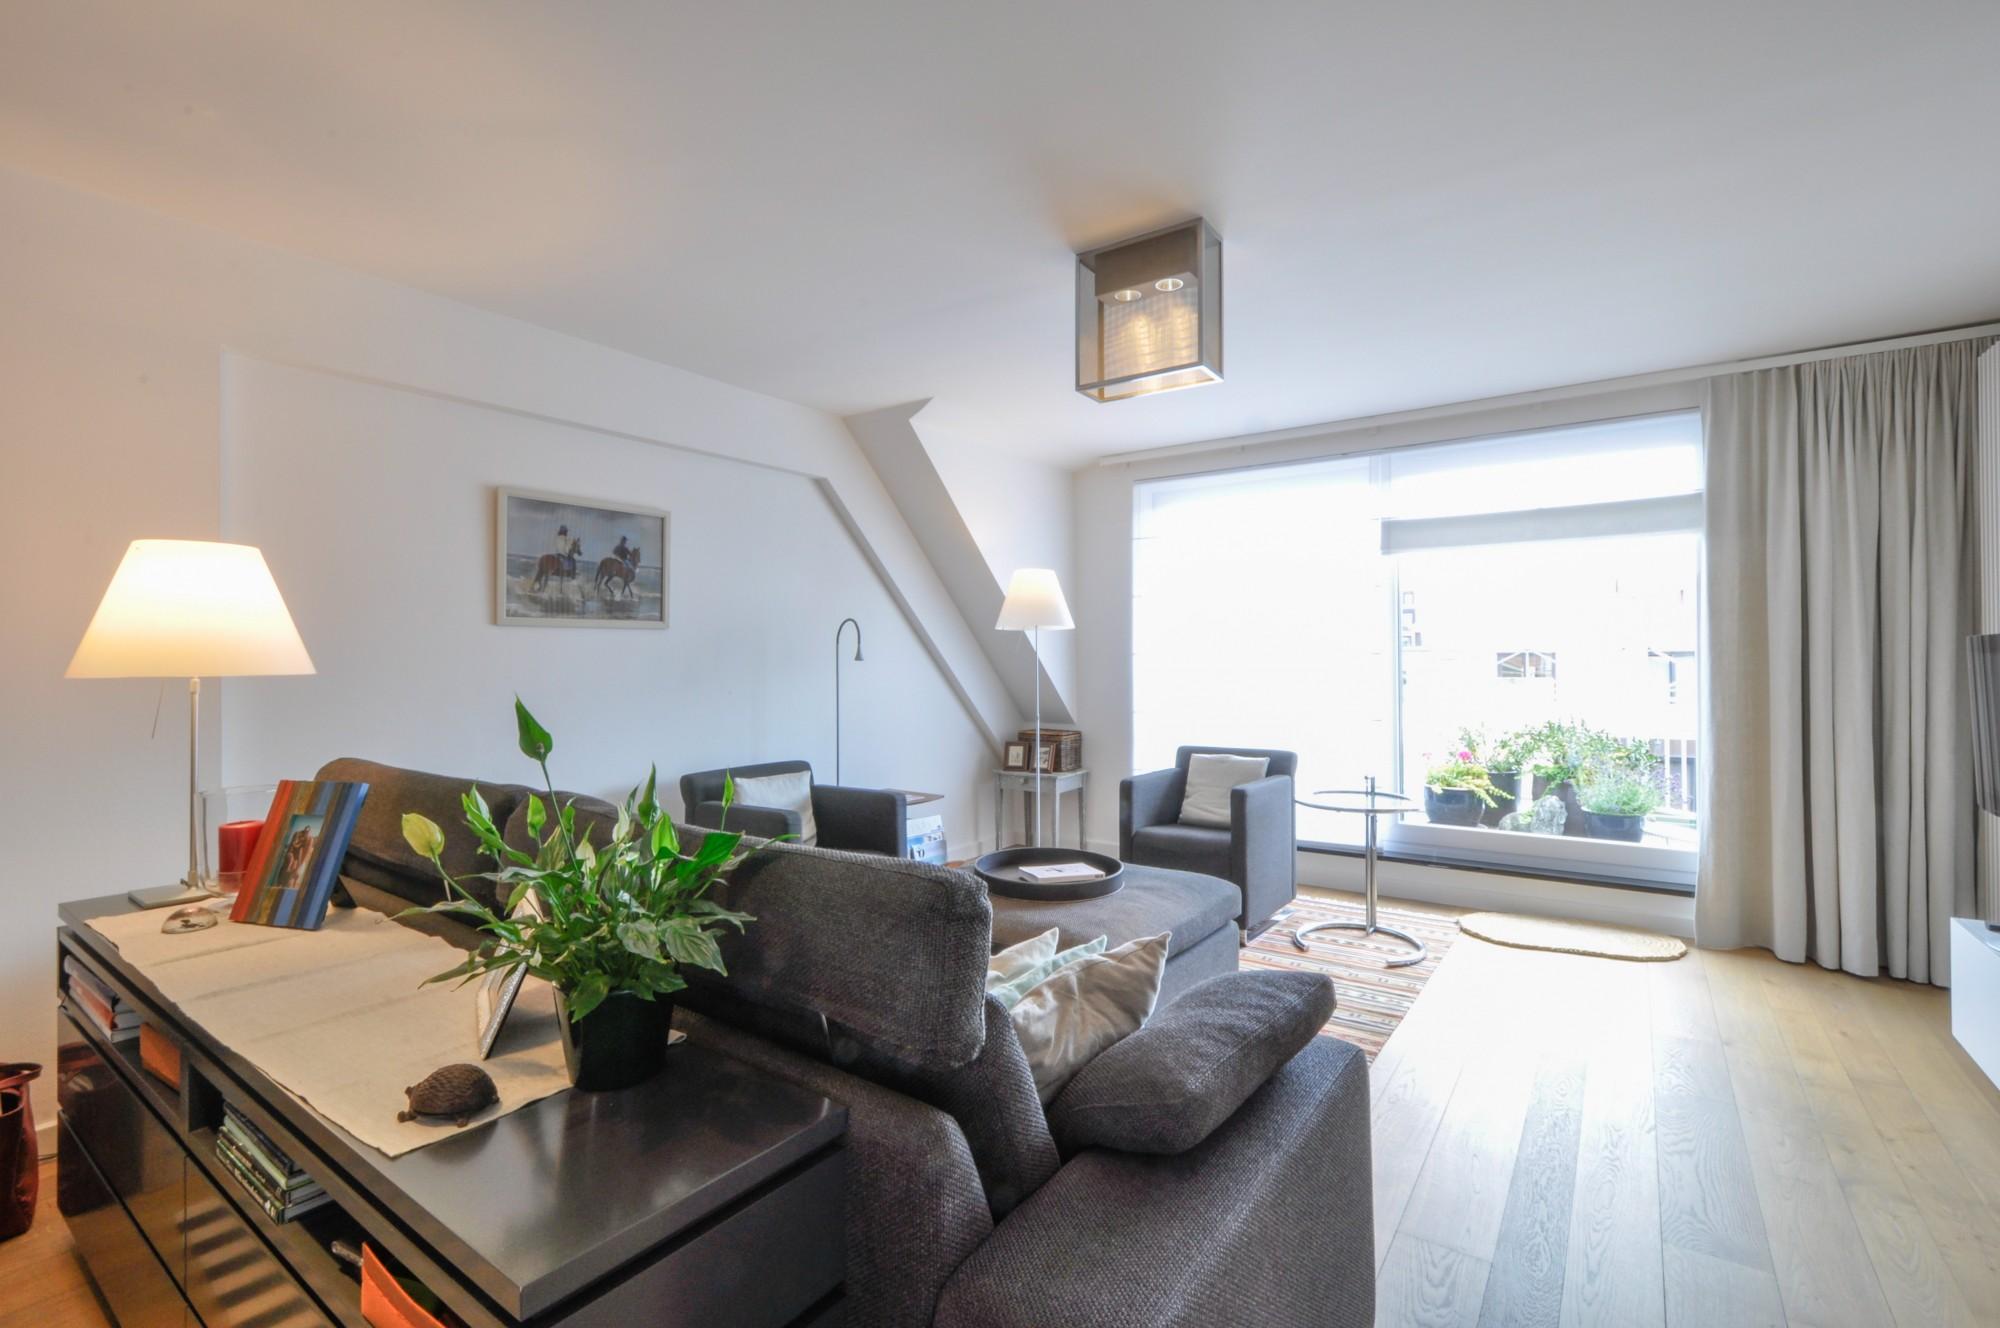 Vente Appartement 2 CH Knokke-Heist - Albertstrand Duplex